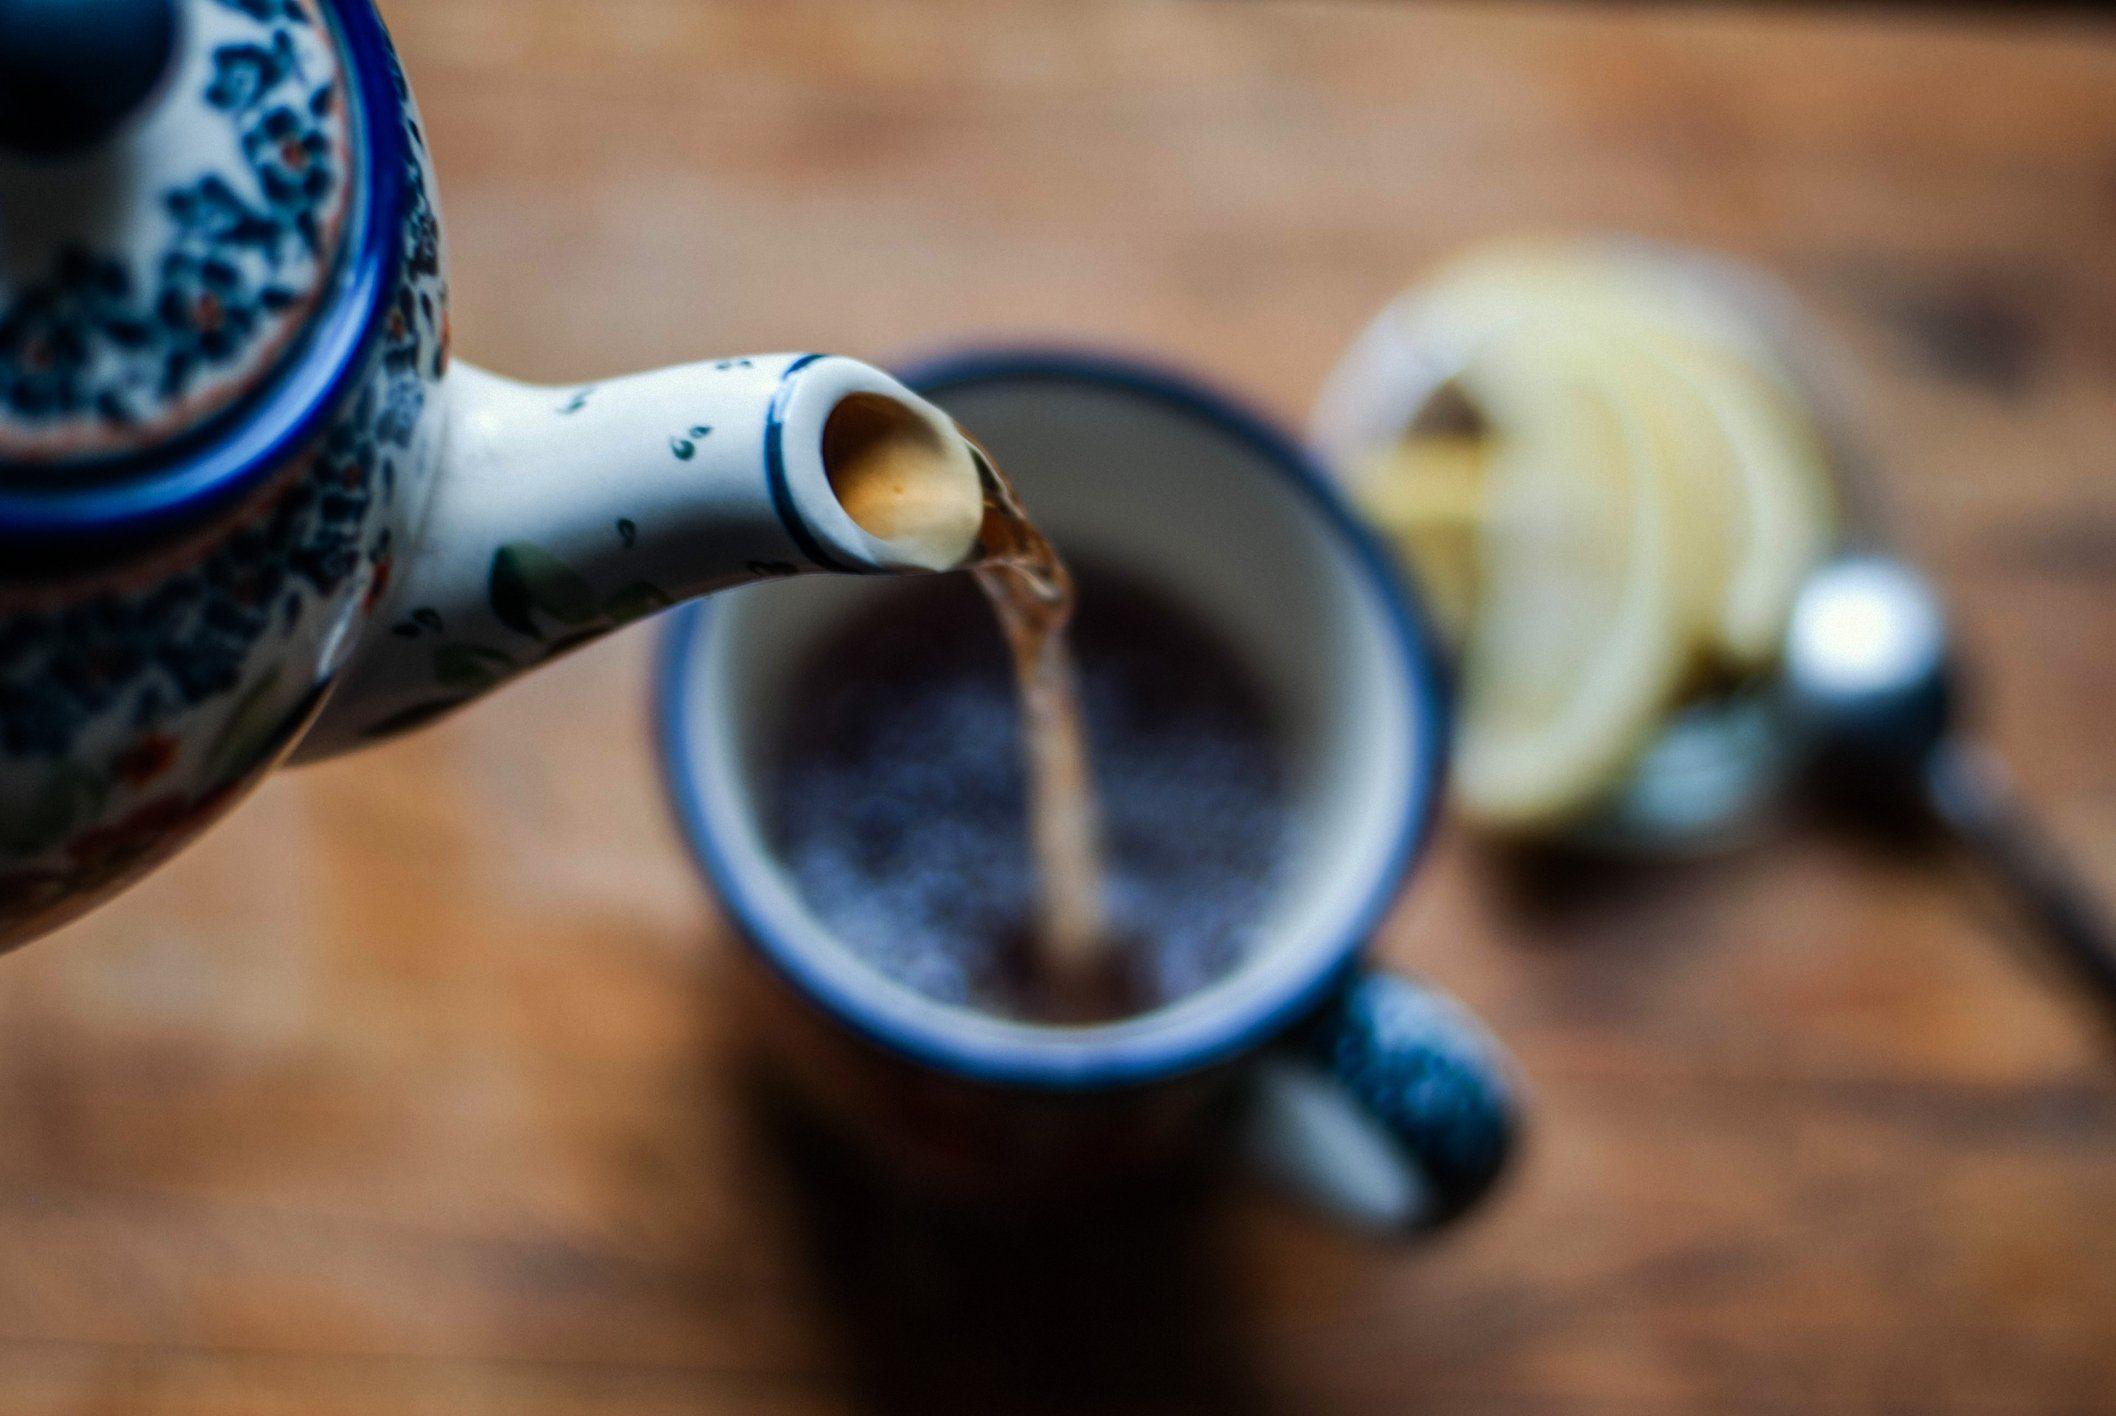 close up of tea kettle pouring tea into tea cup